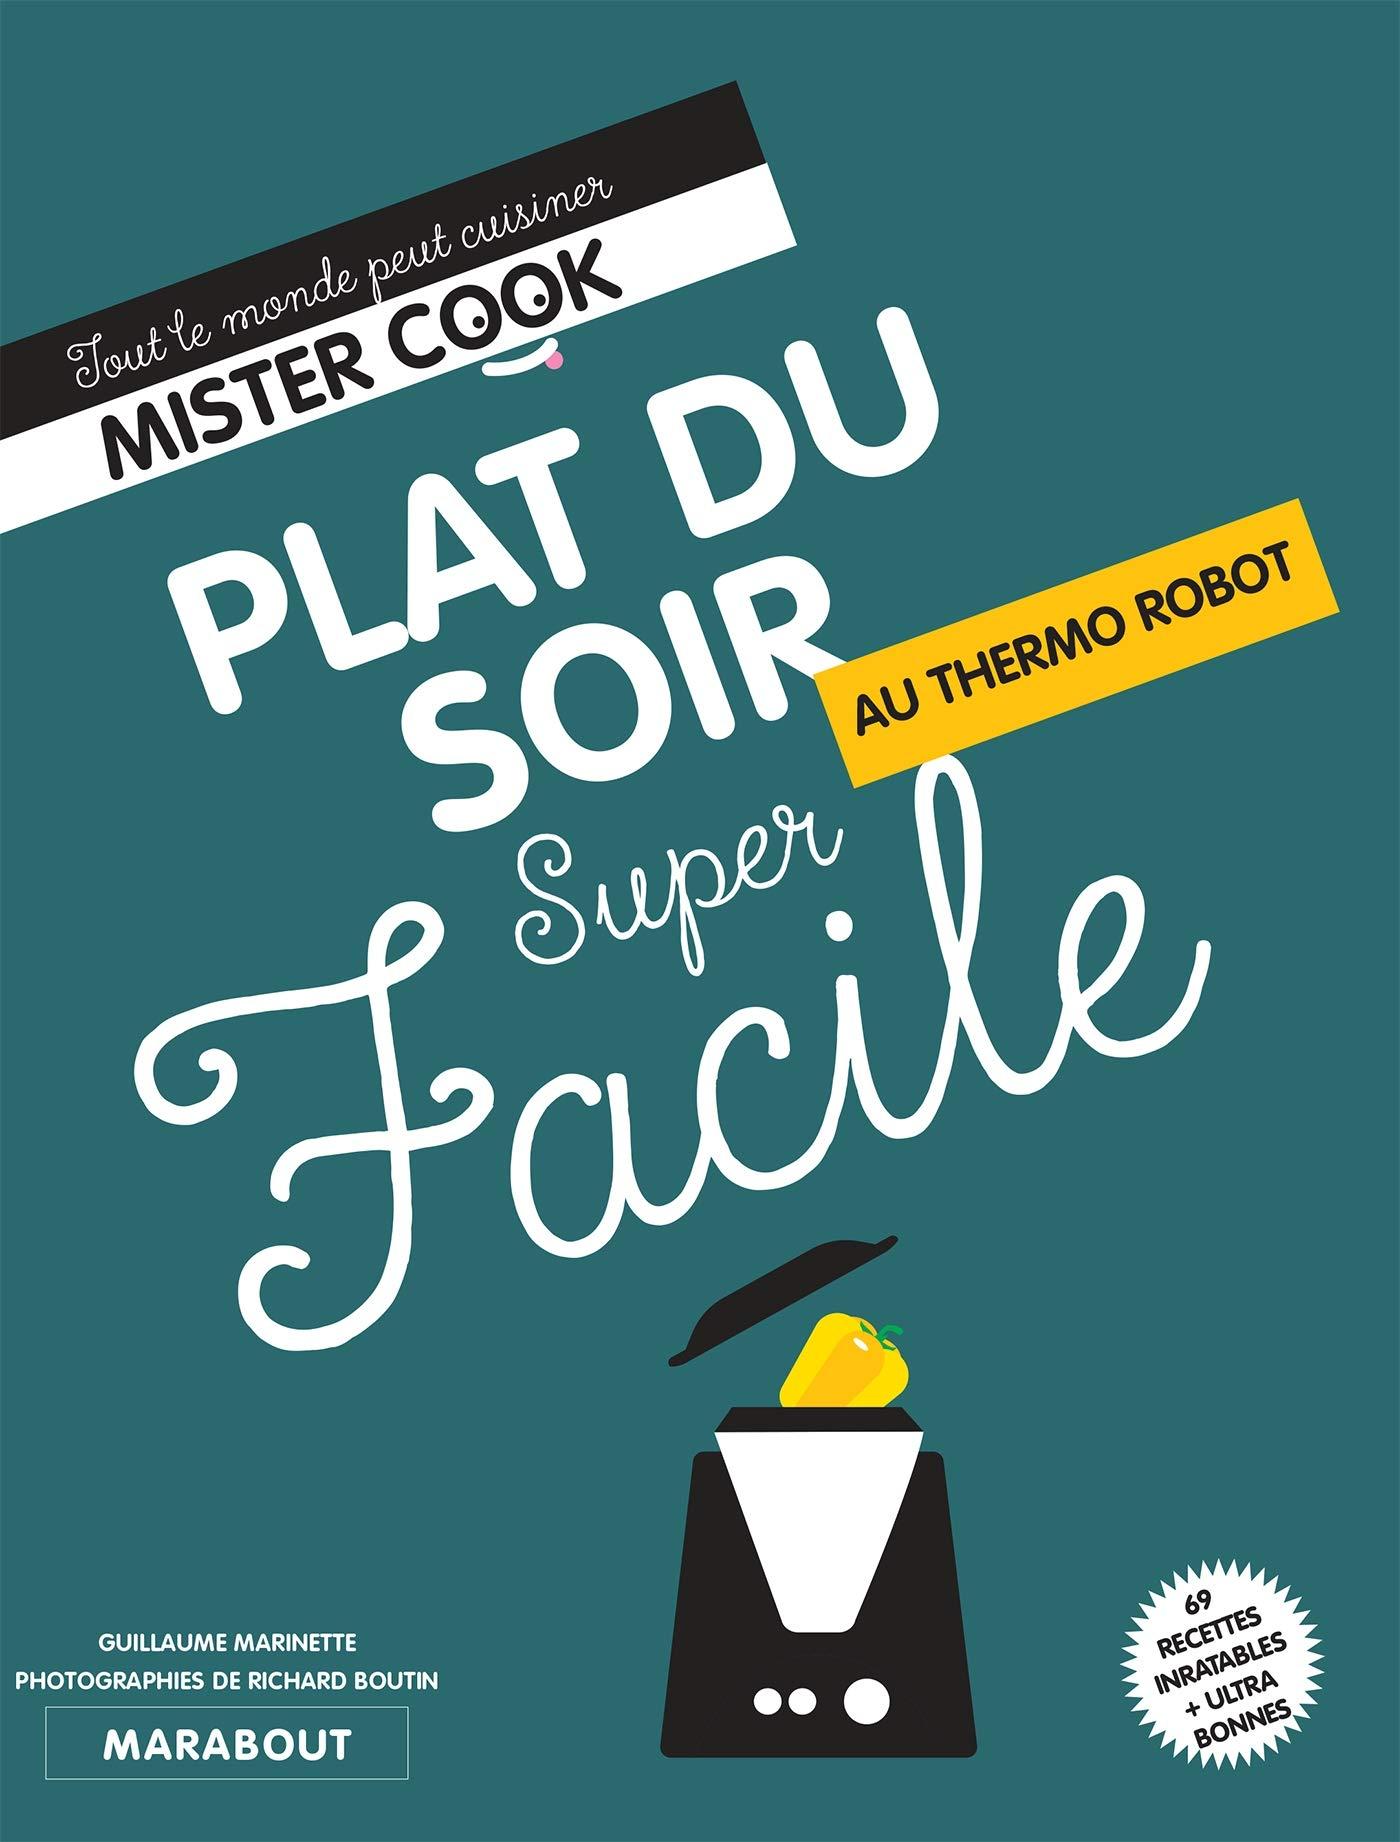 Thermocuiseur plats du soir: 24699 (Cuisine): Amazon.es: Marinette, Guillaume: Libros en idiomas extranjeros